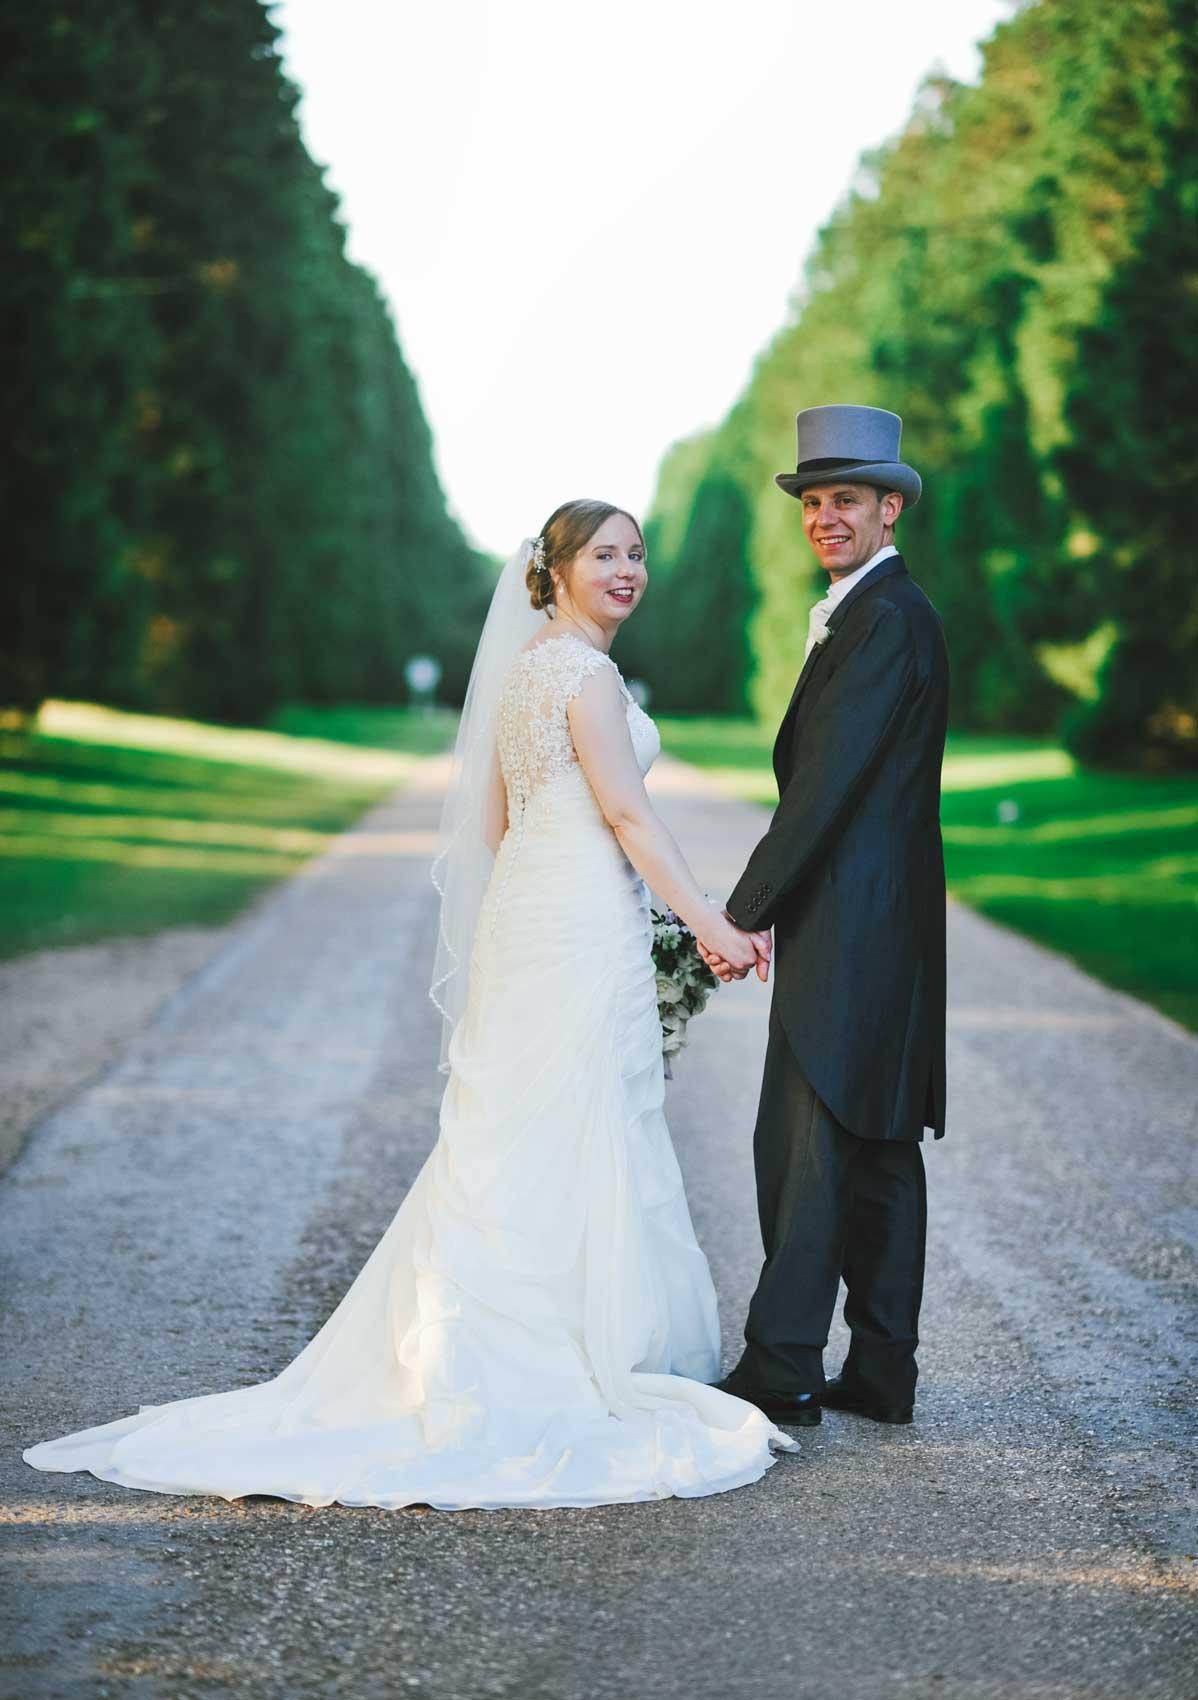 Wedding Photography Highfield Park